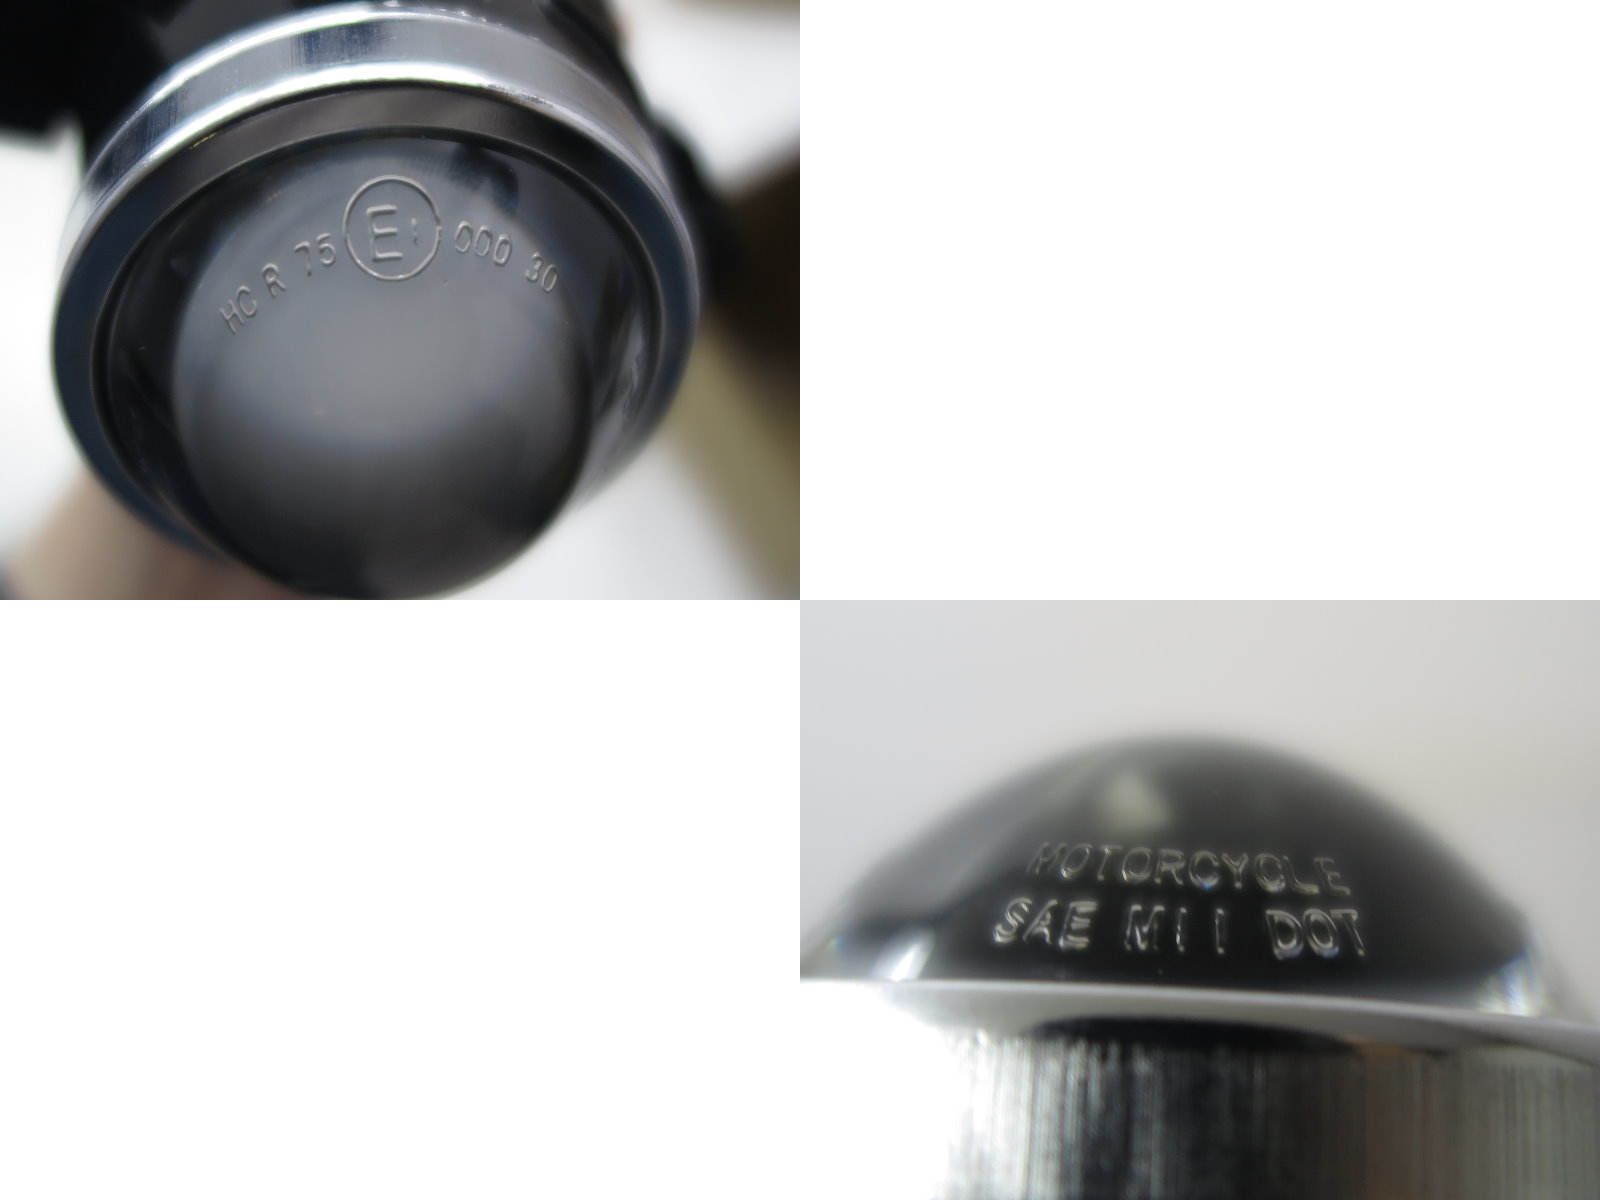 thumbnail 6 - Almera N16 MK2 2002-2006 Facelift 3D/4D/5D Projector Fog Light Black for NISSAN